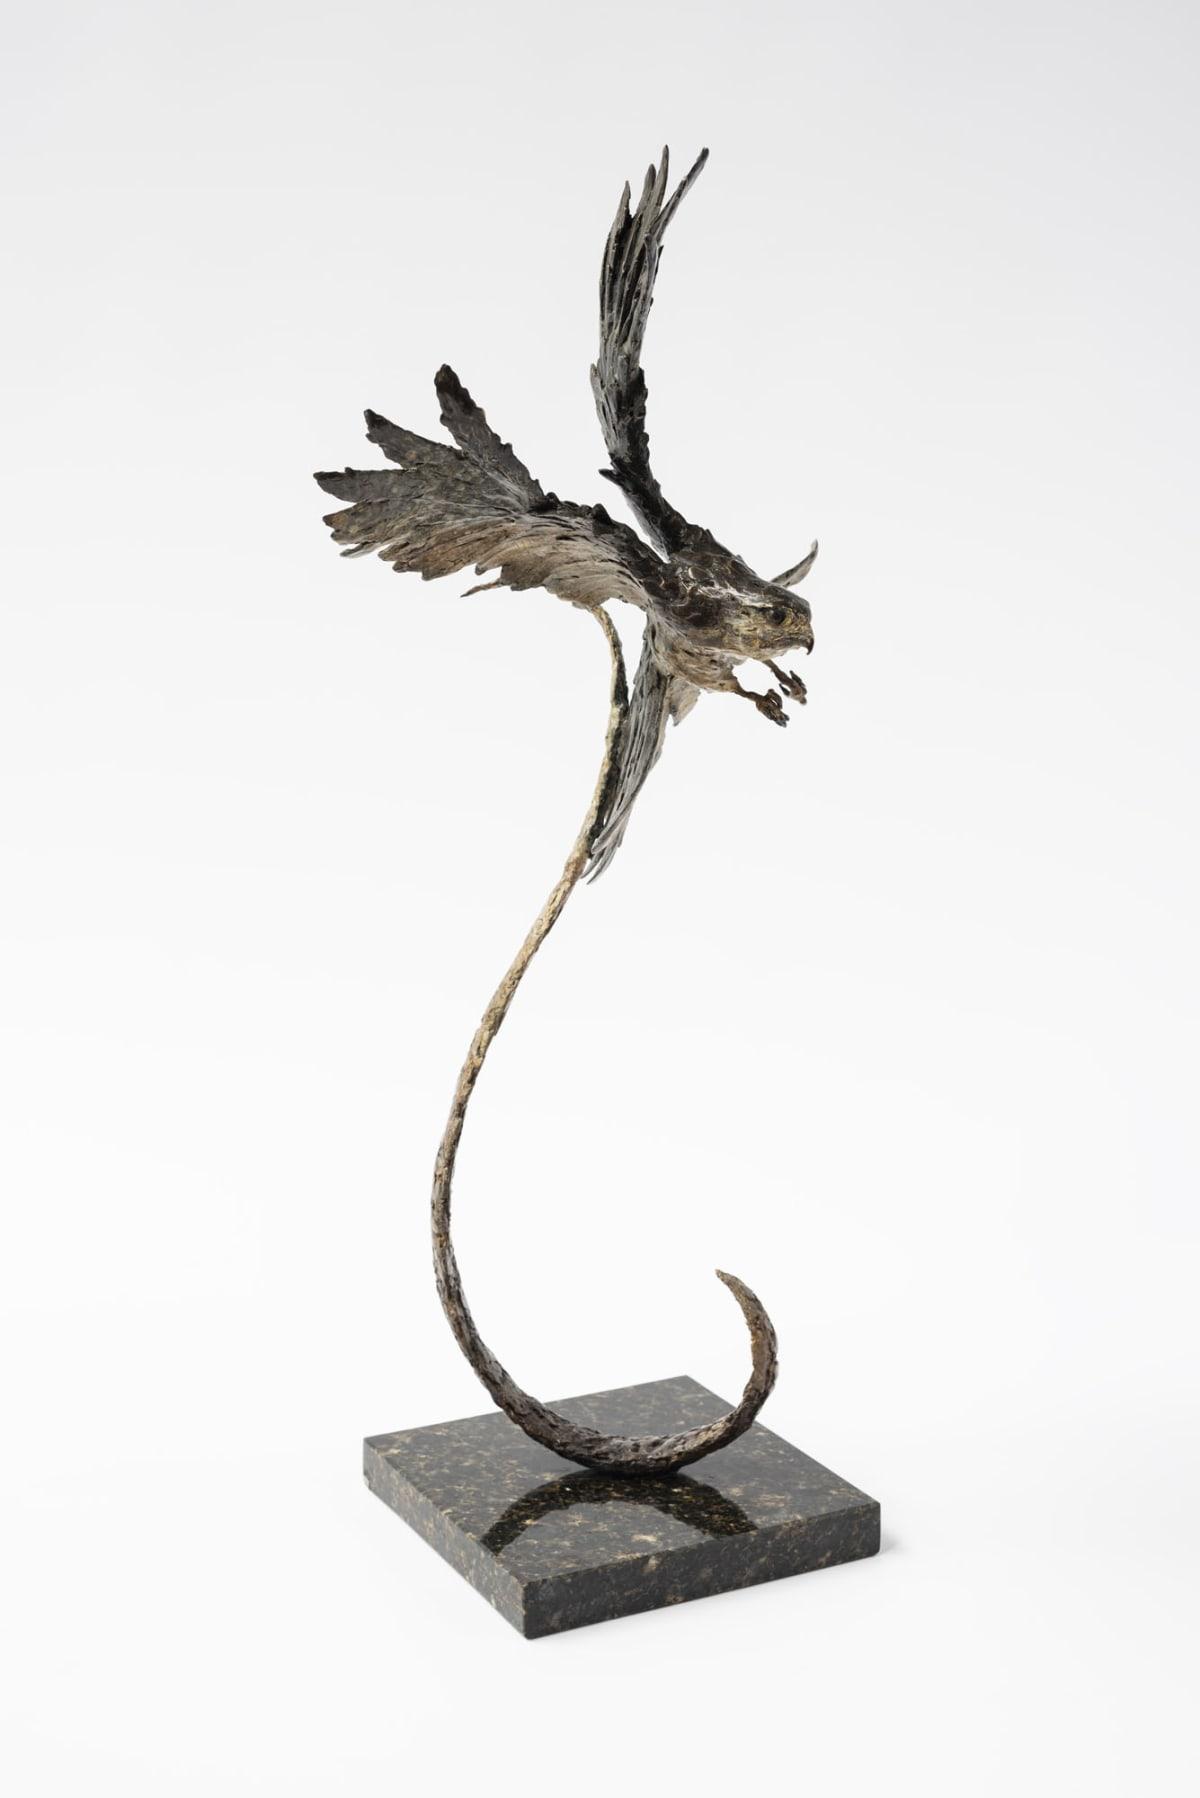 Damon Price Merlin's Approach, 2019 Bronze Sculpture 70 x 36 x 28 cm 27 1/2 x 14 1/8 x 11 1/8 in Edition 1 of 15